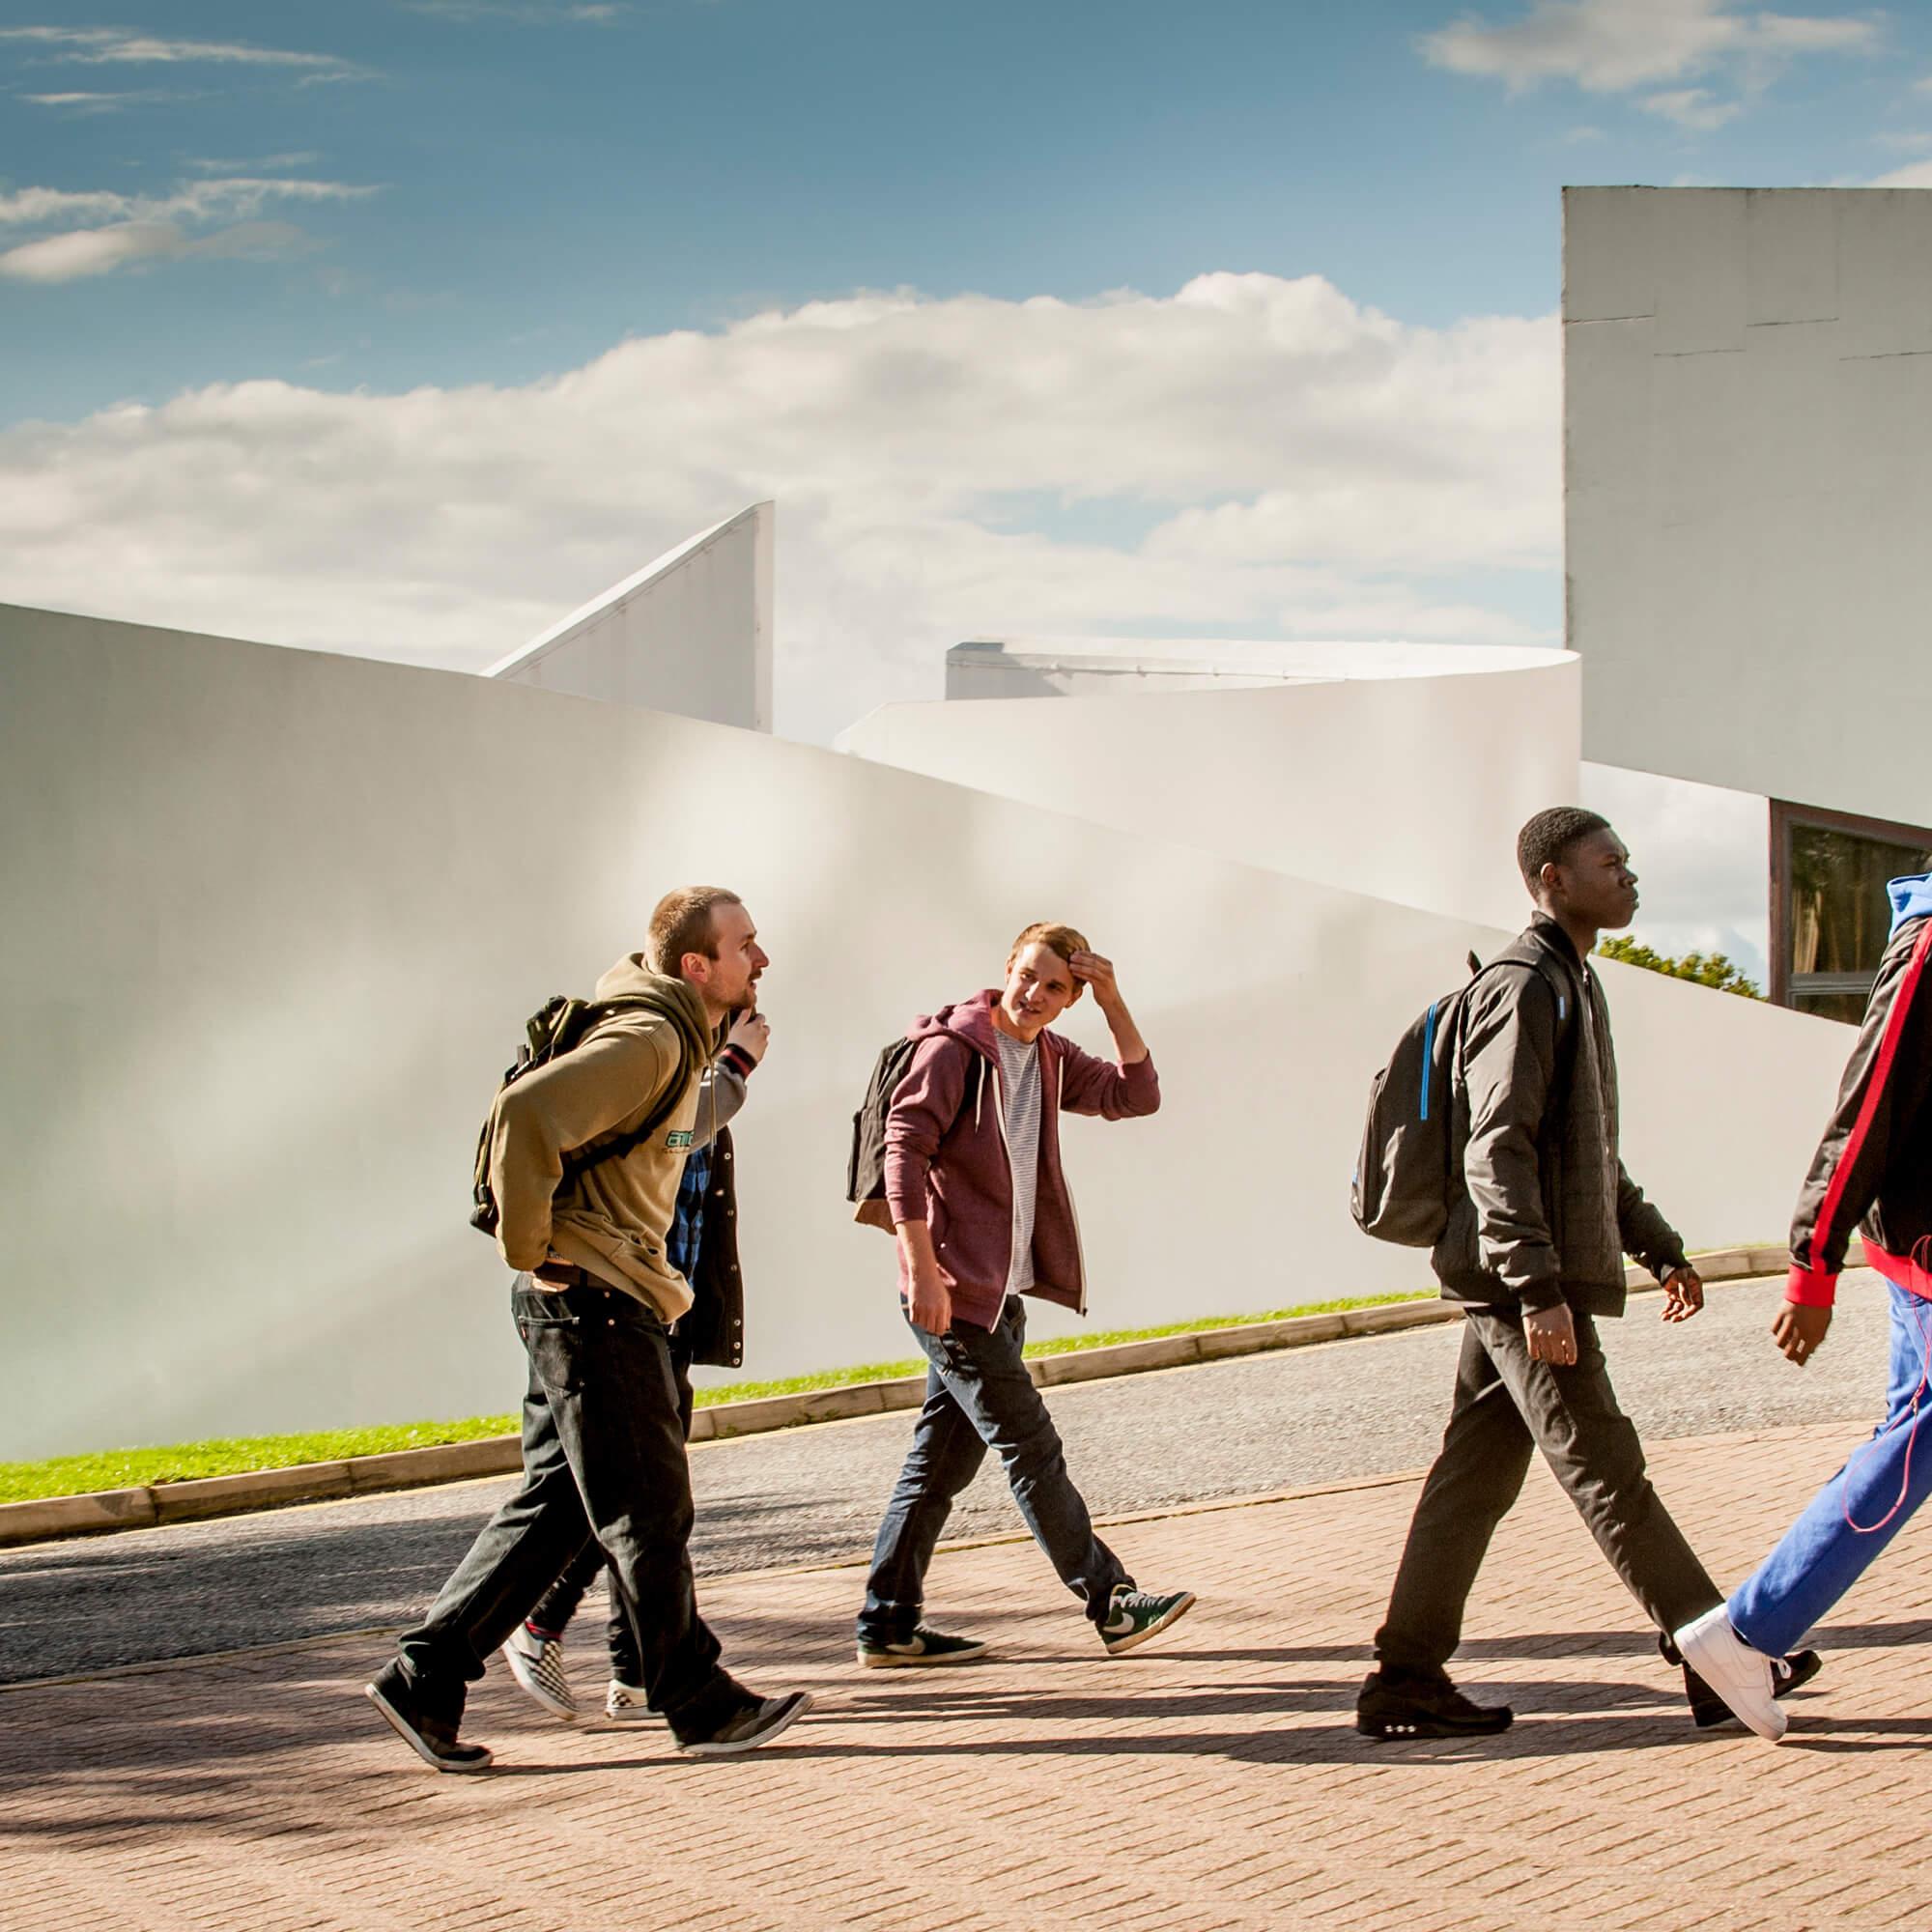 a group of students walking up past the Faith Centre at Kedleston Road